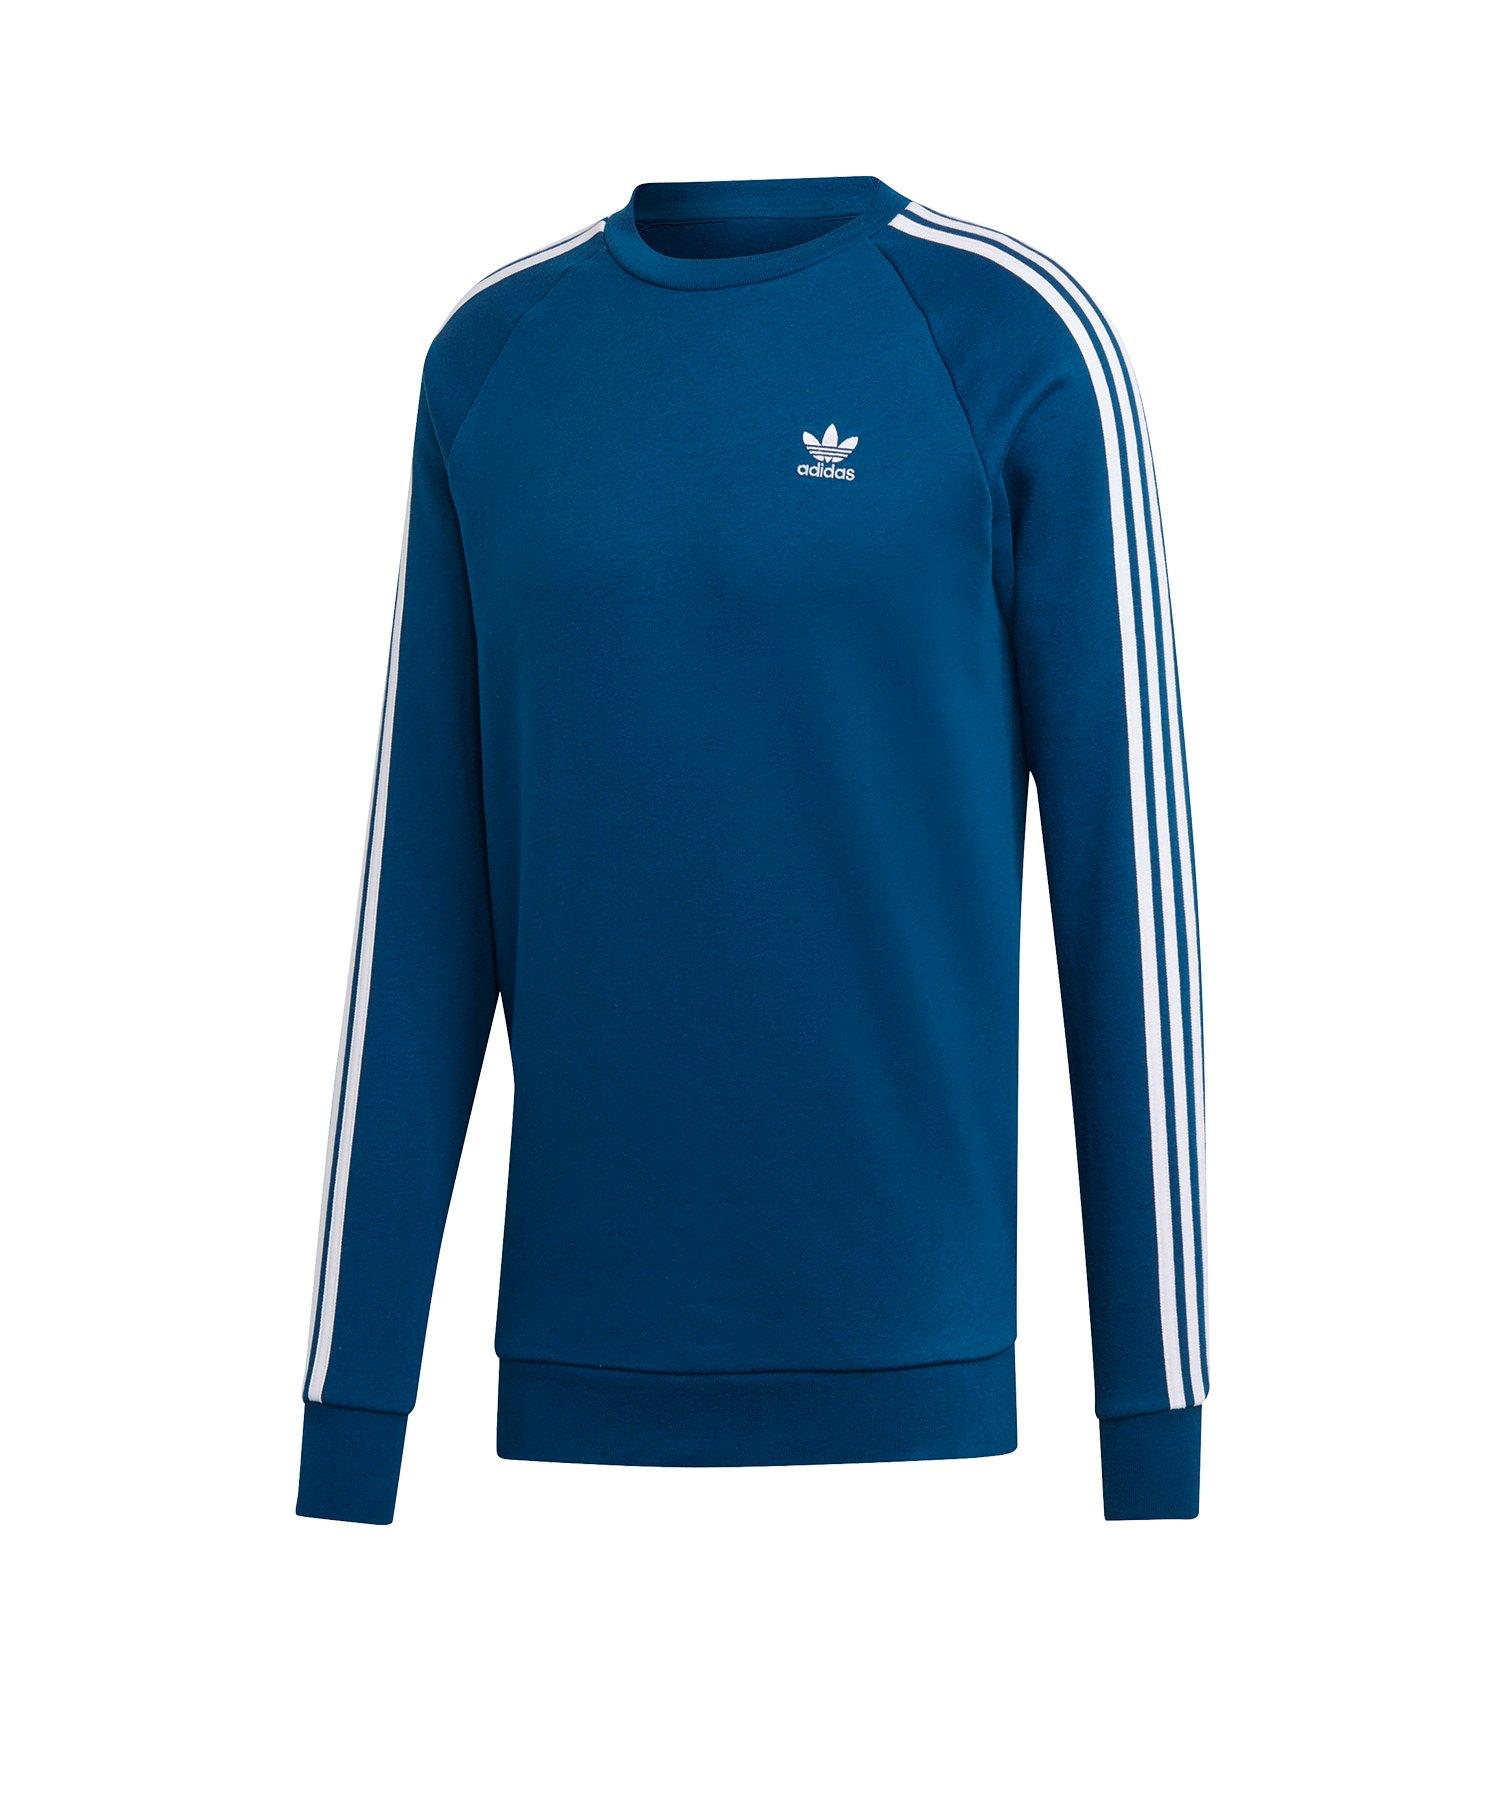 adidas Originals 3 Stripes Crew Sweatshirt Blau